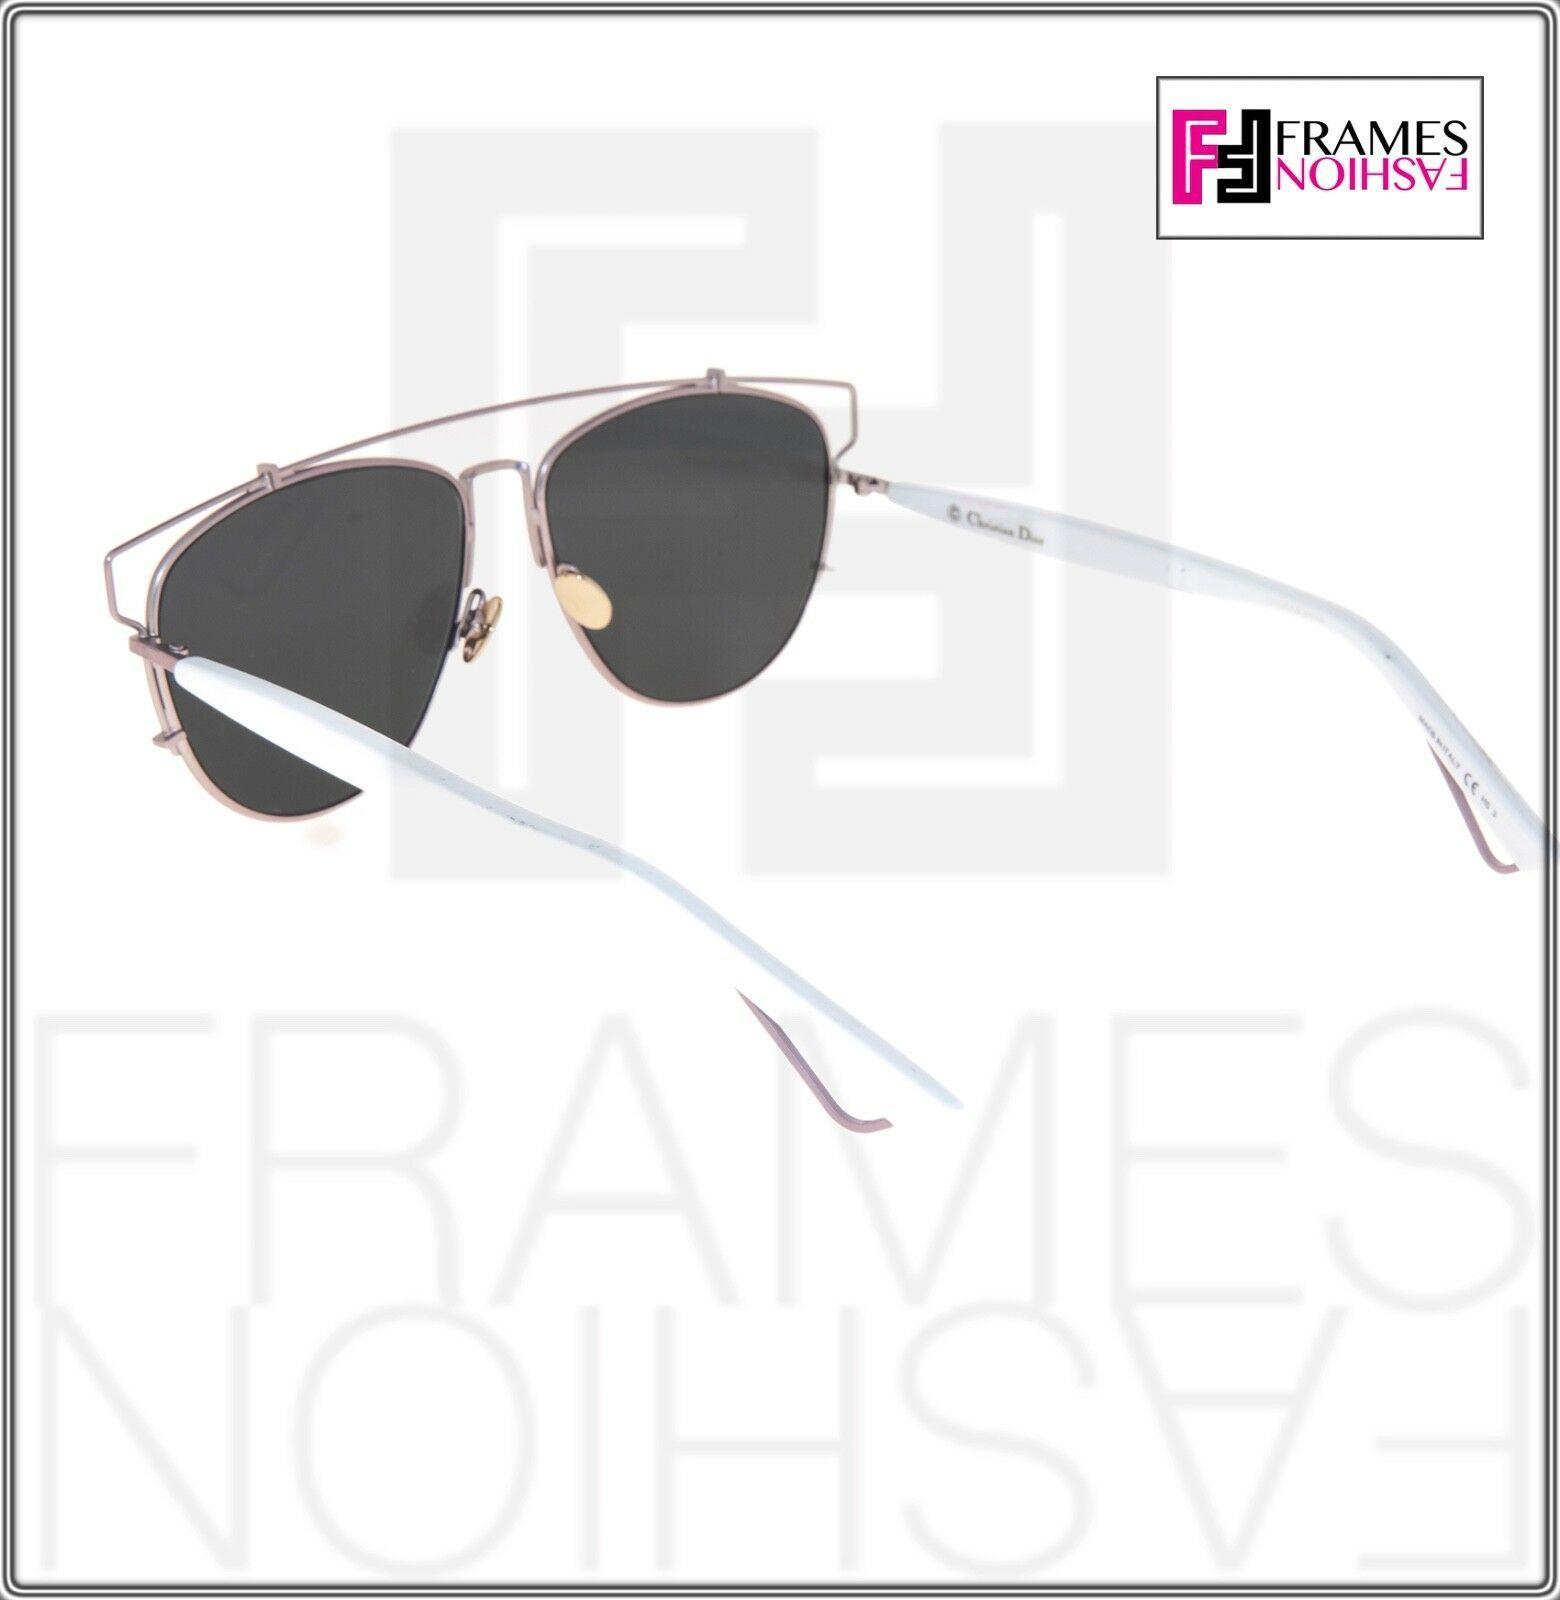 CHRISTIAN DIOR TECHNOLOGIC White Lilac Flash Mirrored Sunglasses DIORTECHNOLOGIC image 3